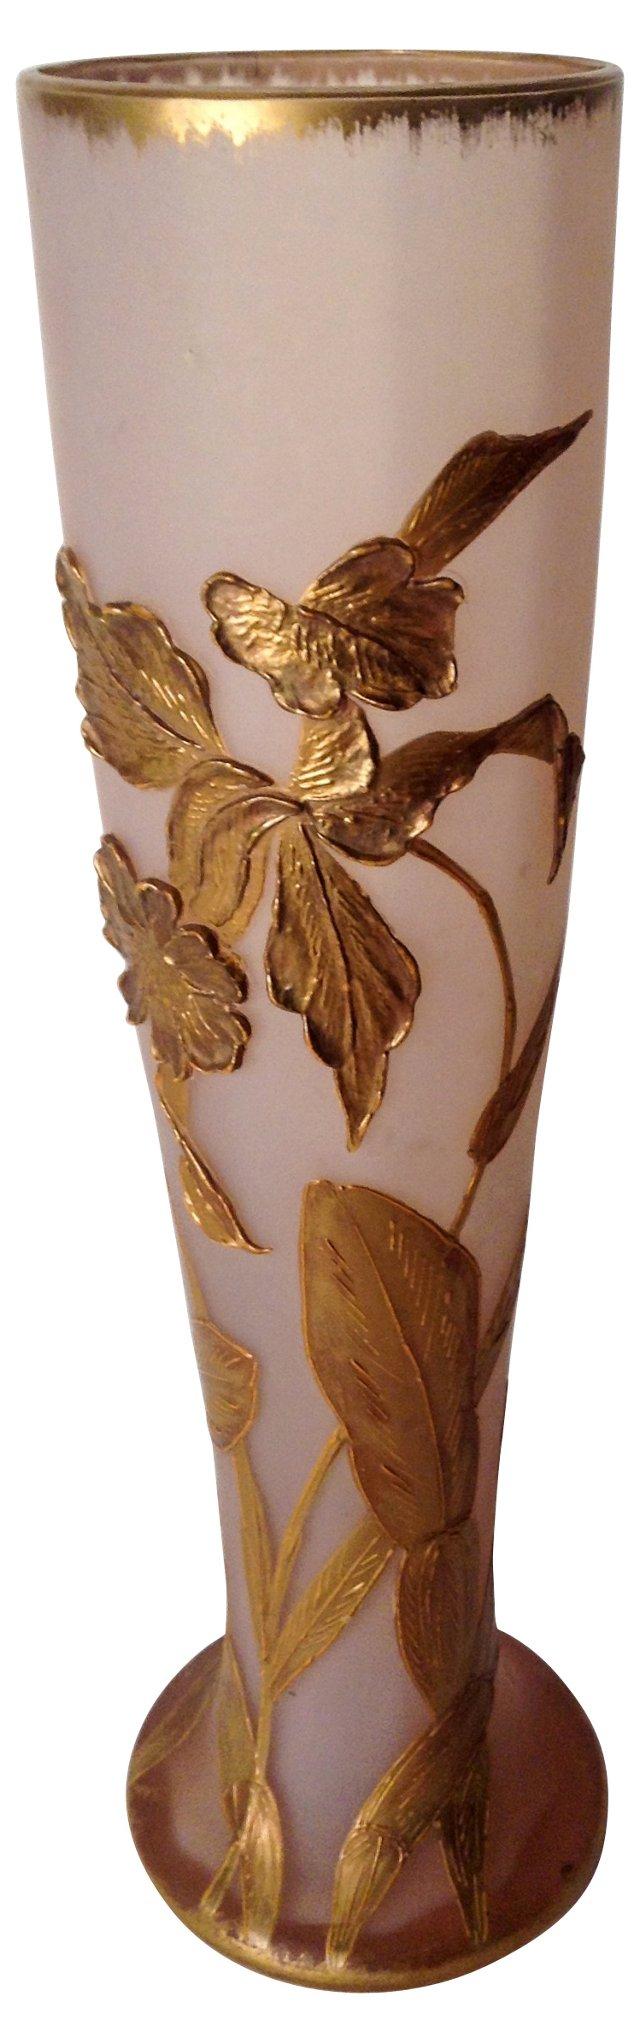 Pink & Gilt-Encrusted Art Nouveau Vase